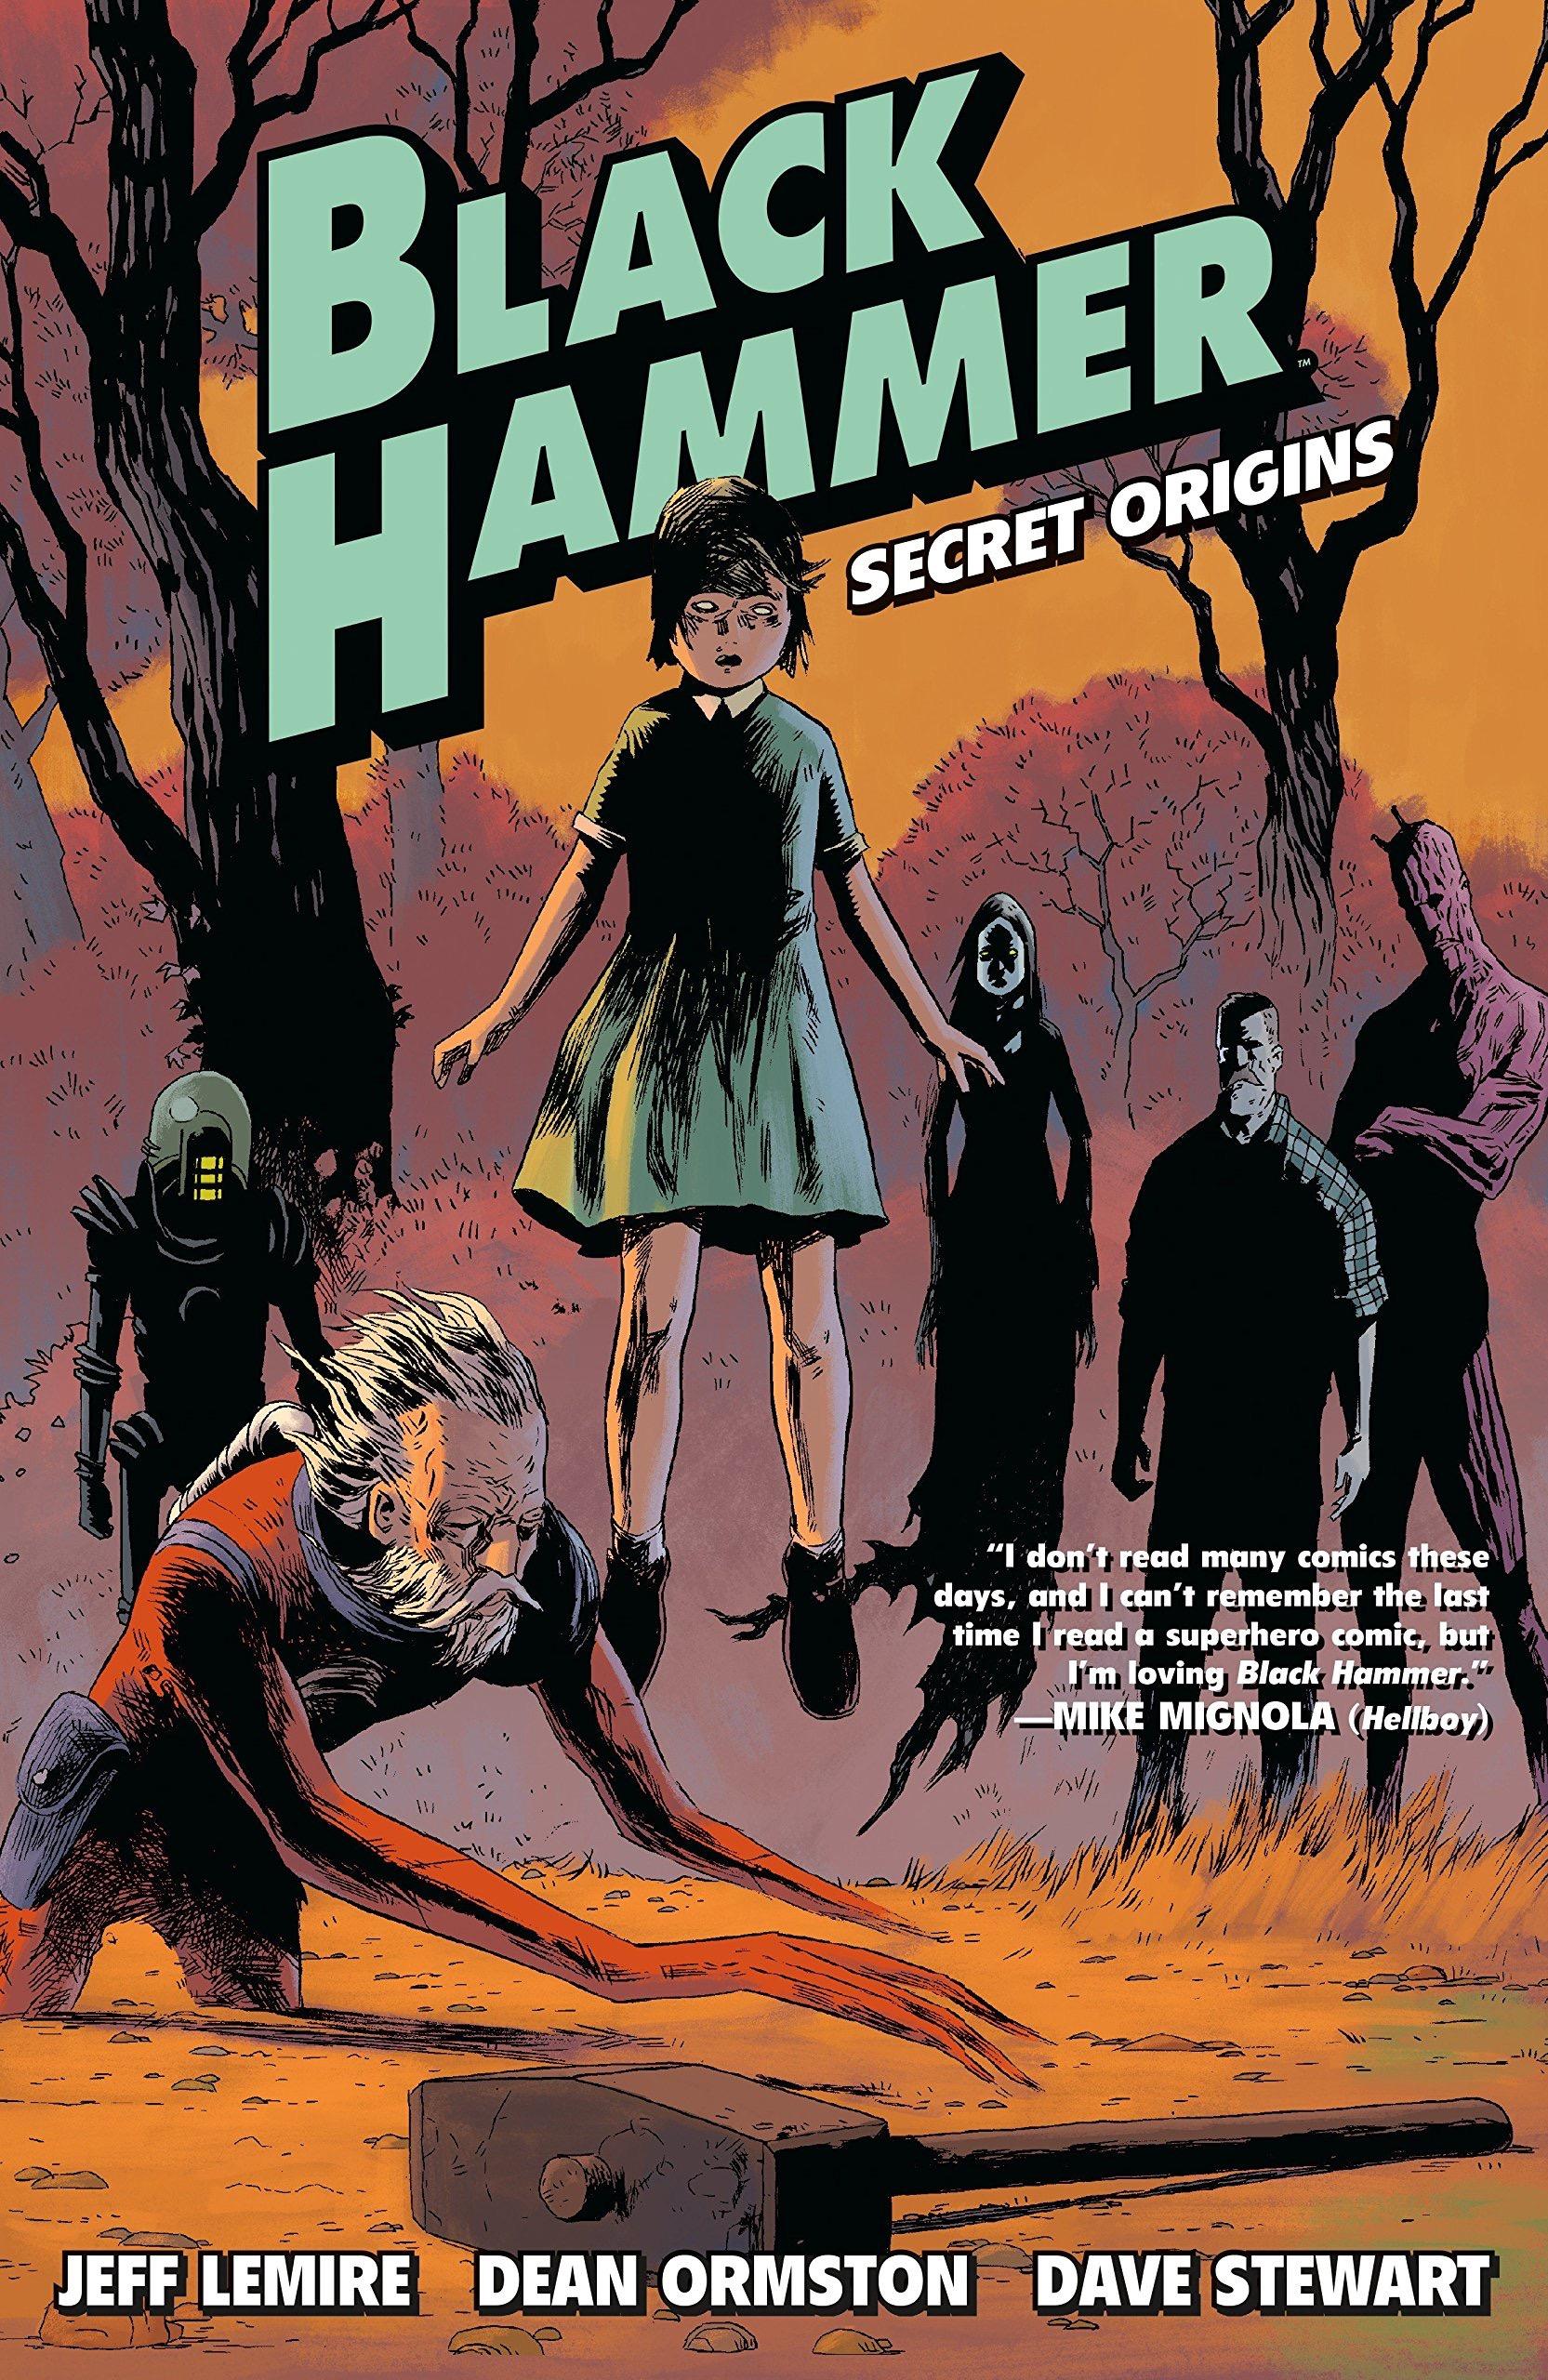 Jeff Lemire interview Black Hammer